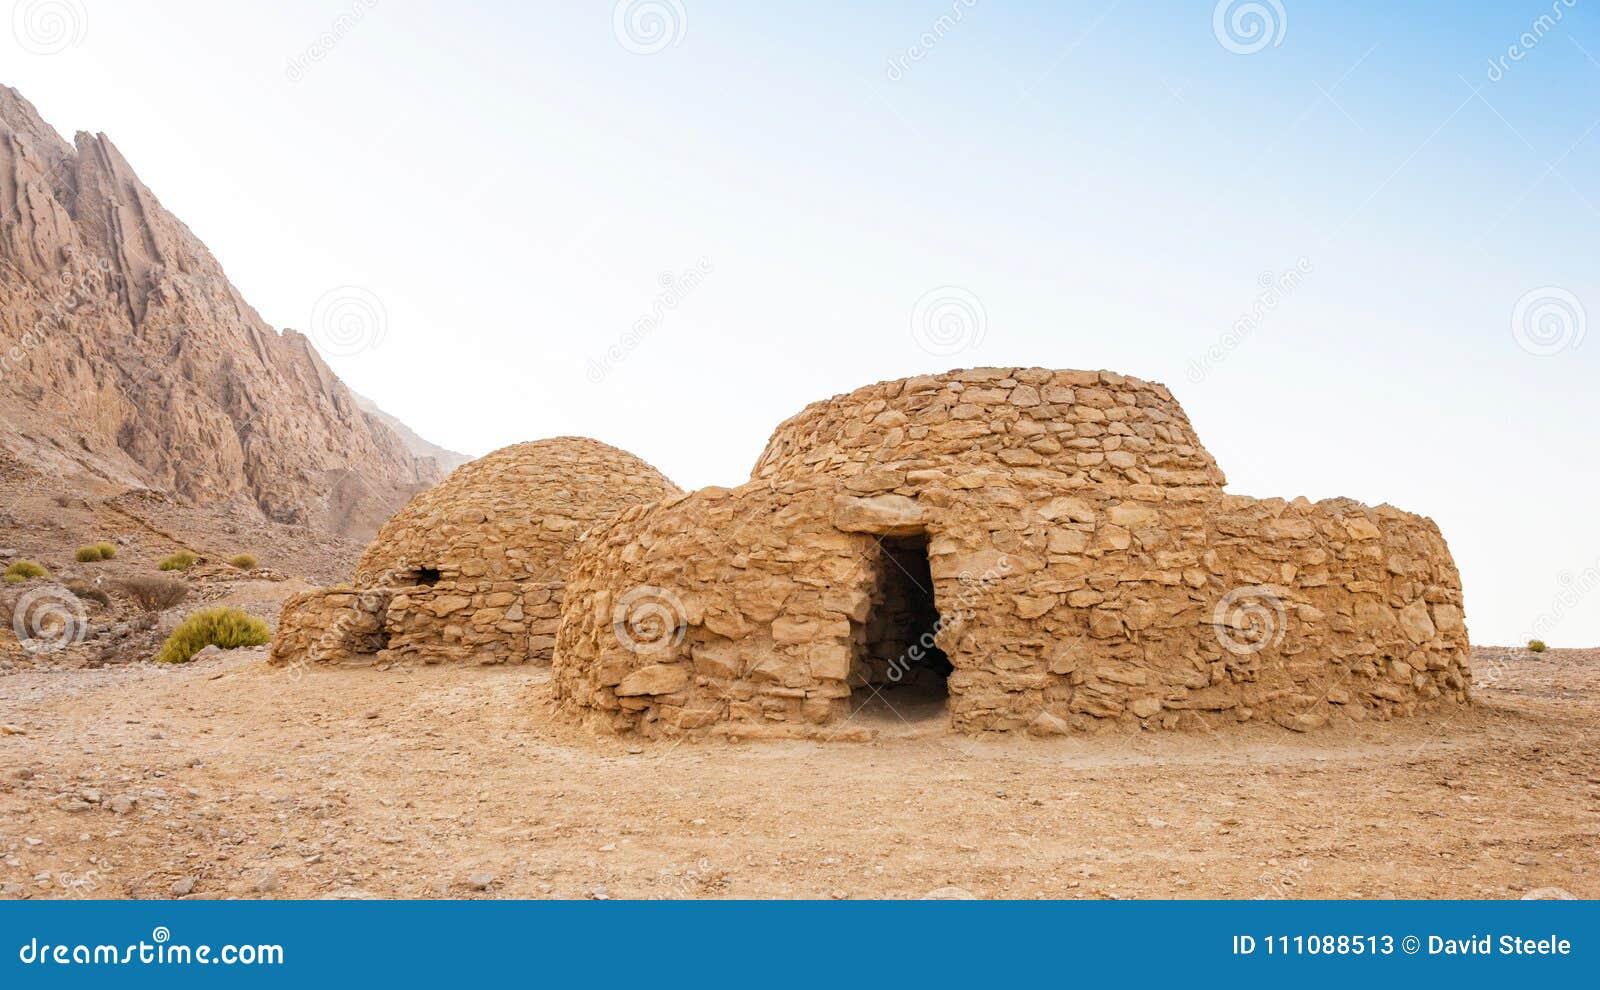 Jebel Hafeet Tombs in the UAE